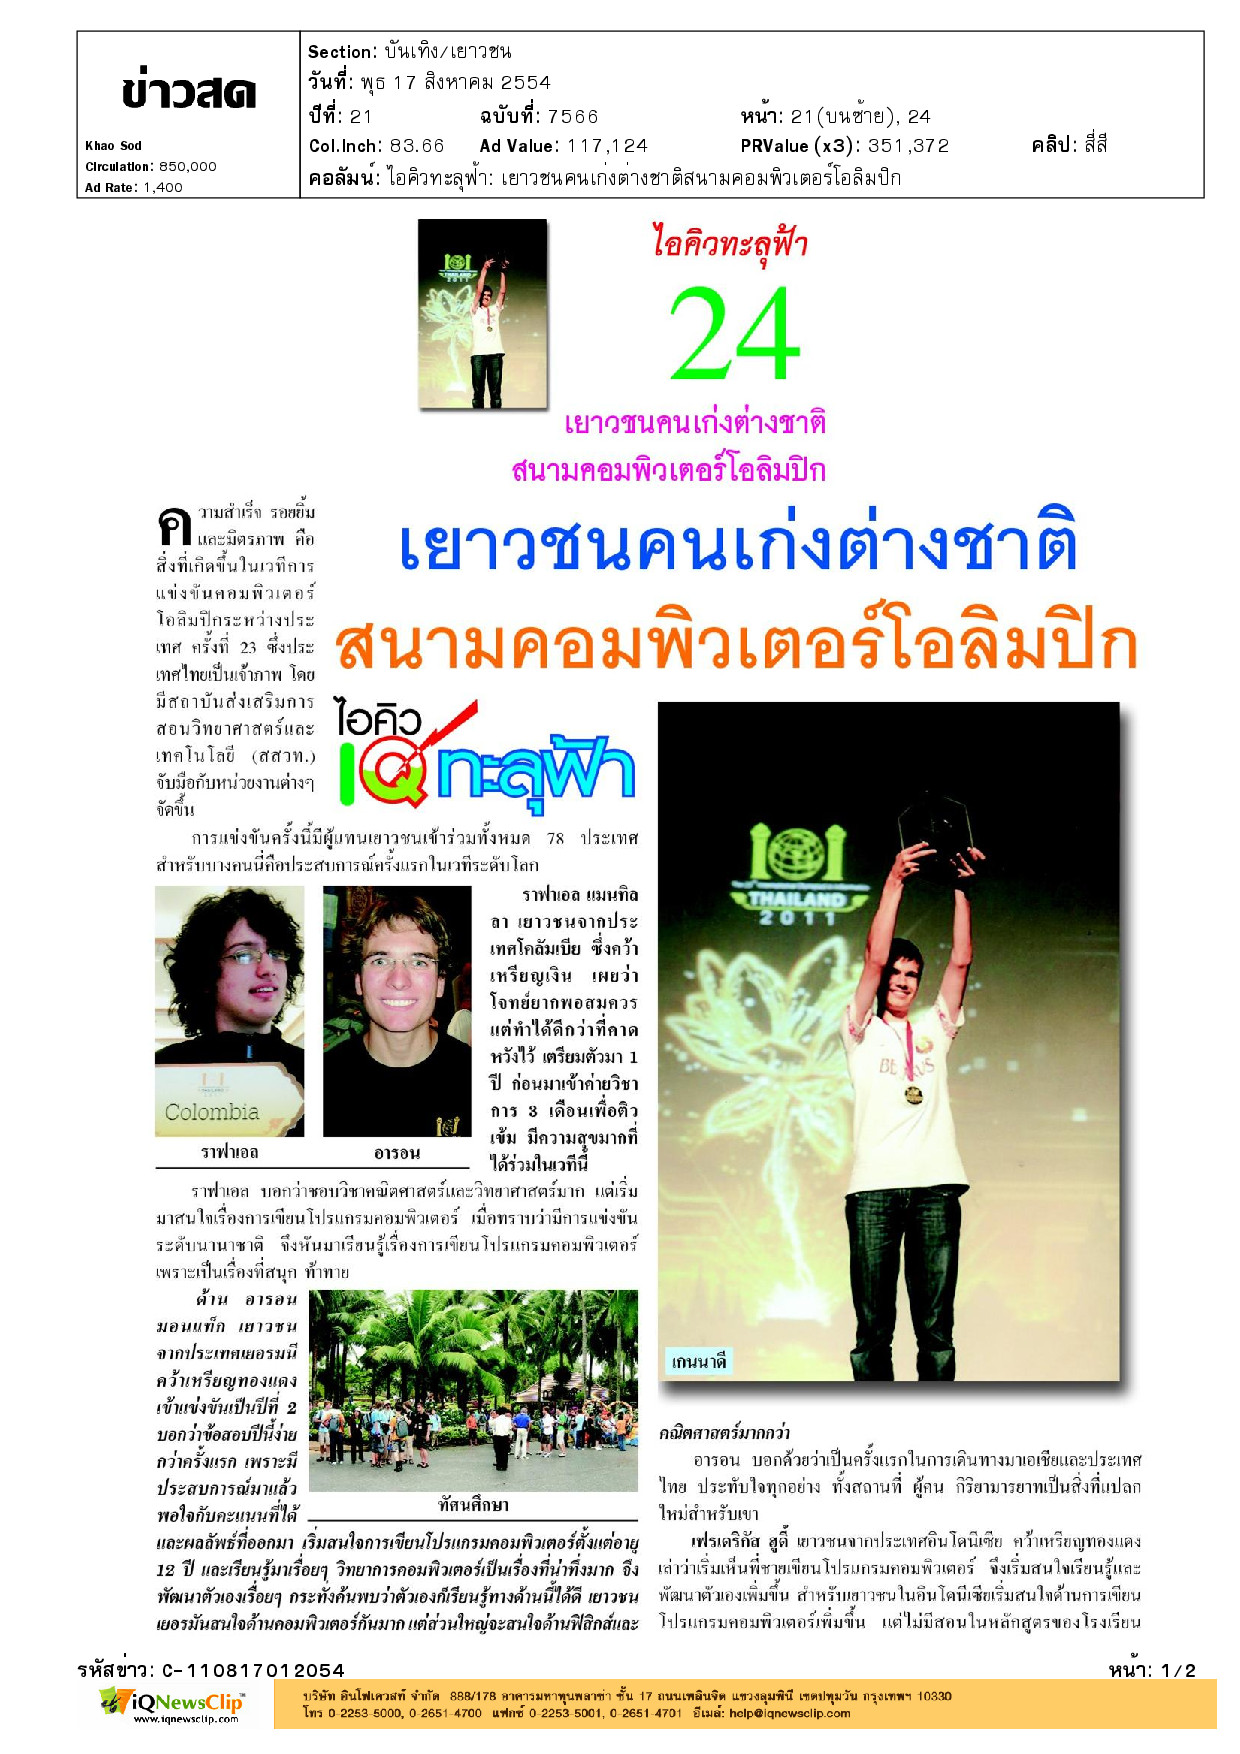 C-110817012054.pdf-0